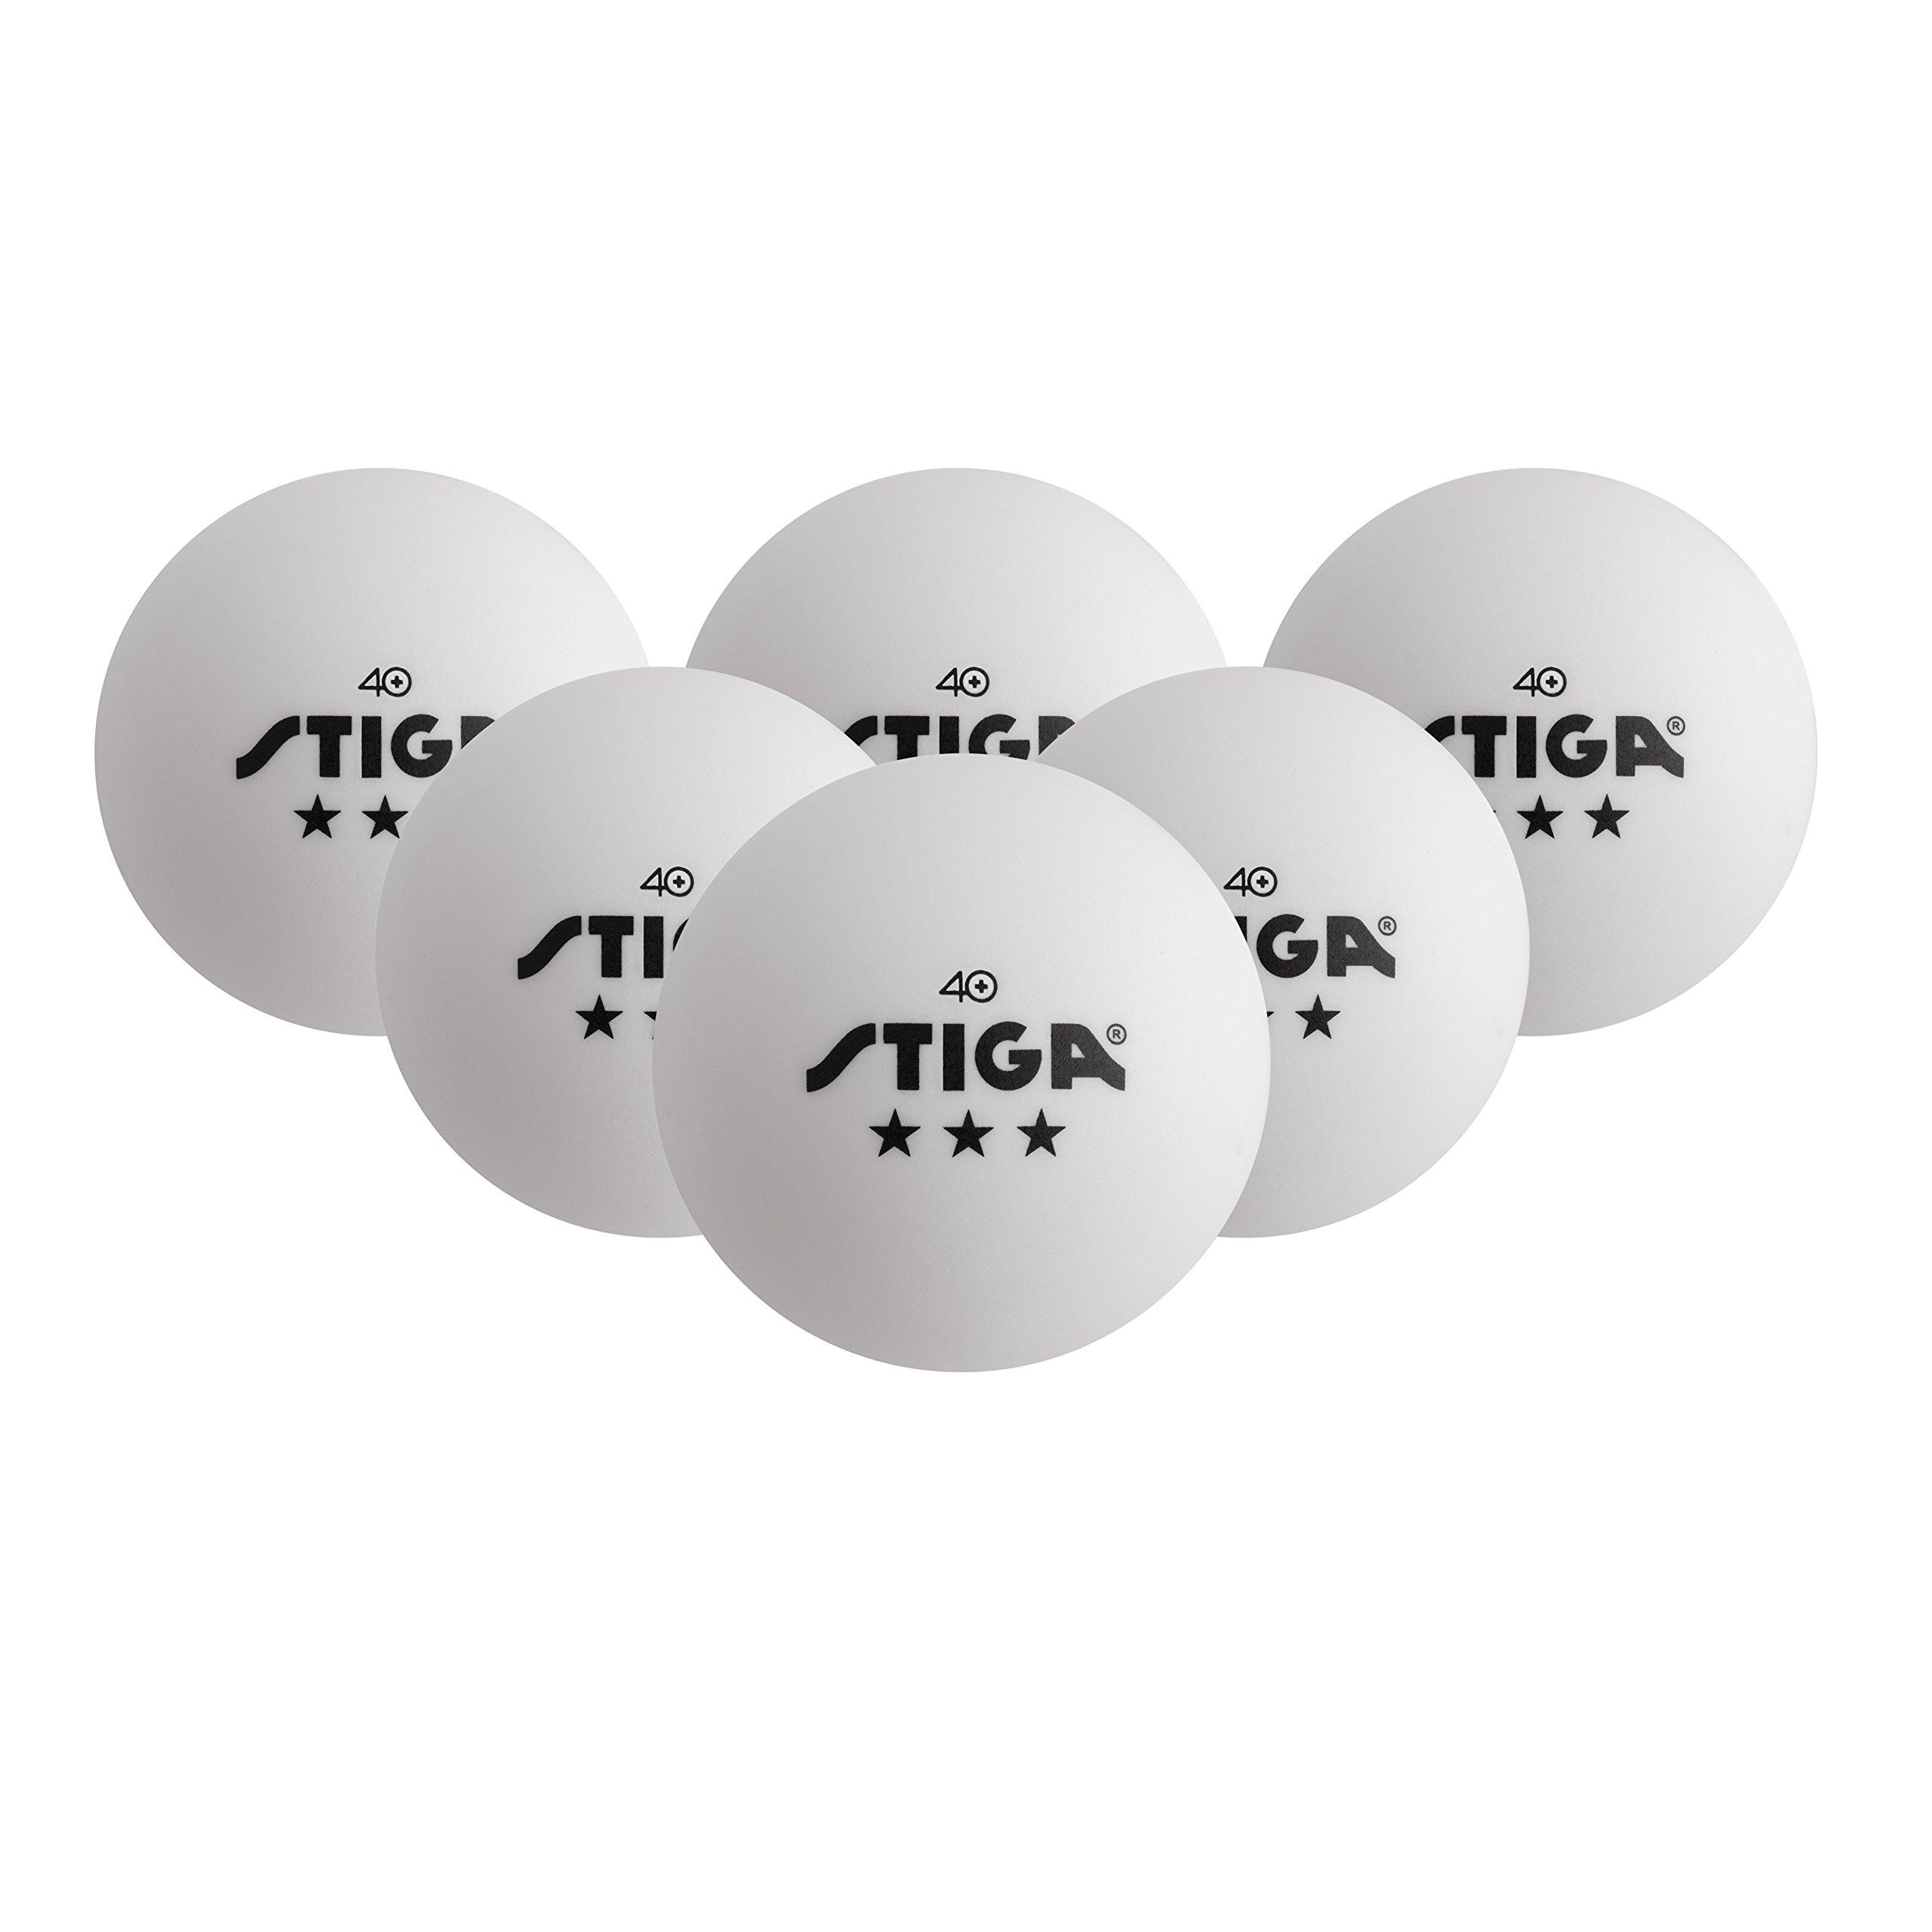 12 Pelotas de Ping Pong 3 Estrellas STIGA